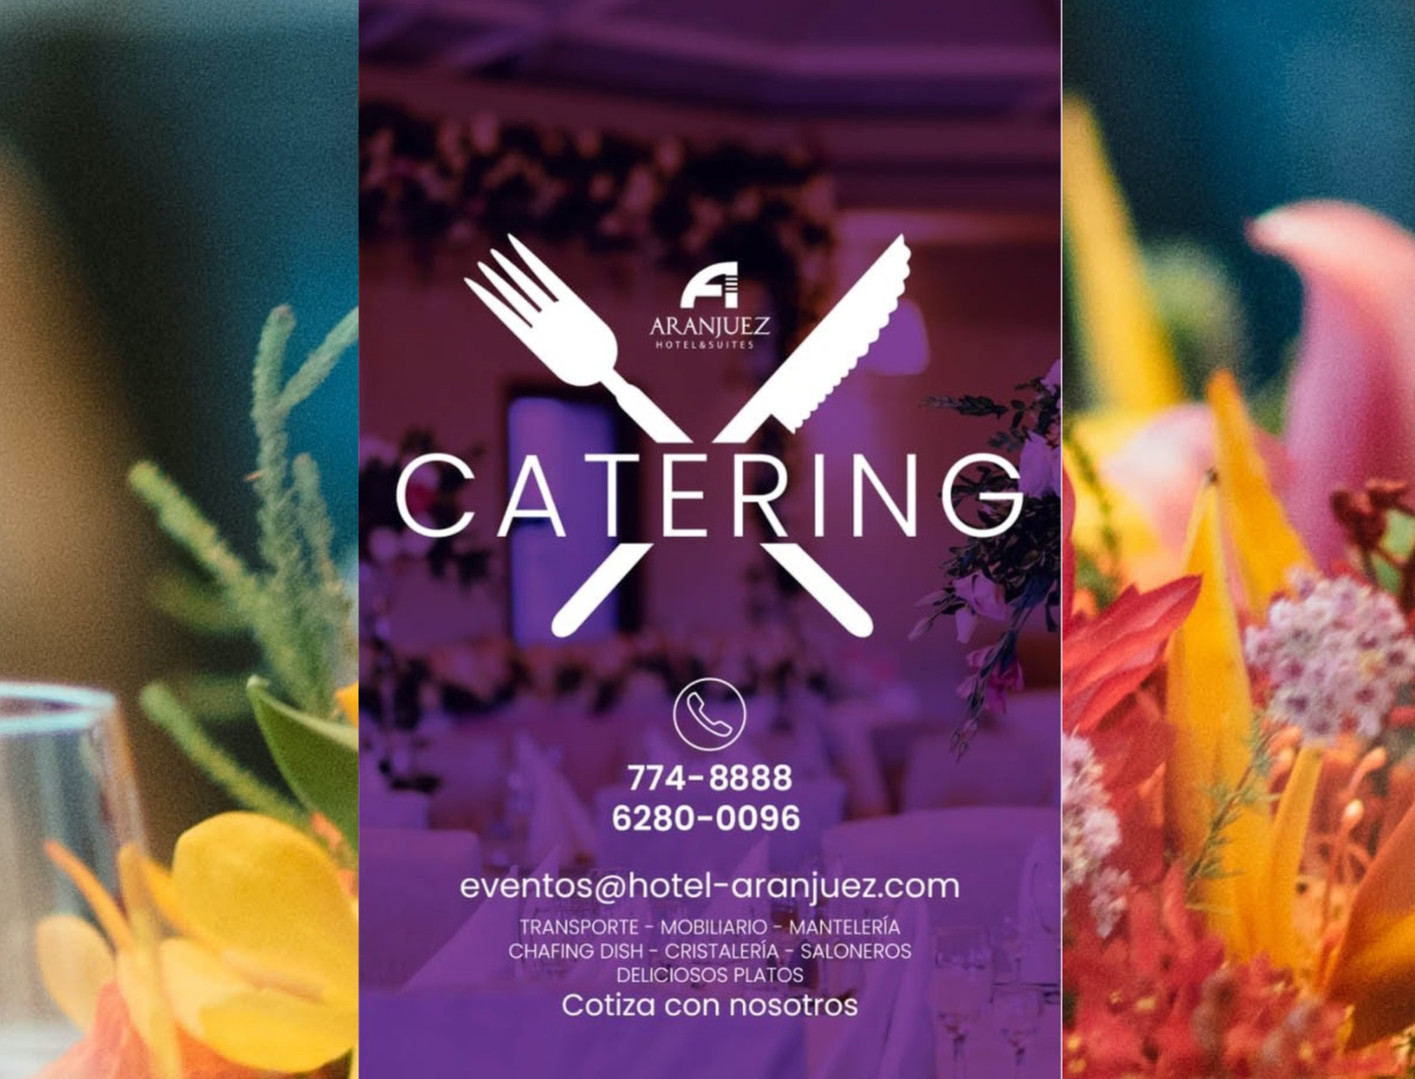 Catering Service in David, Chiriqui